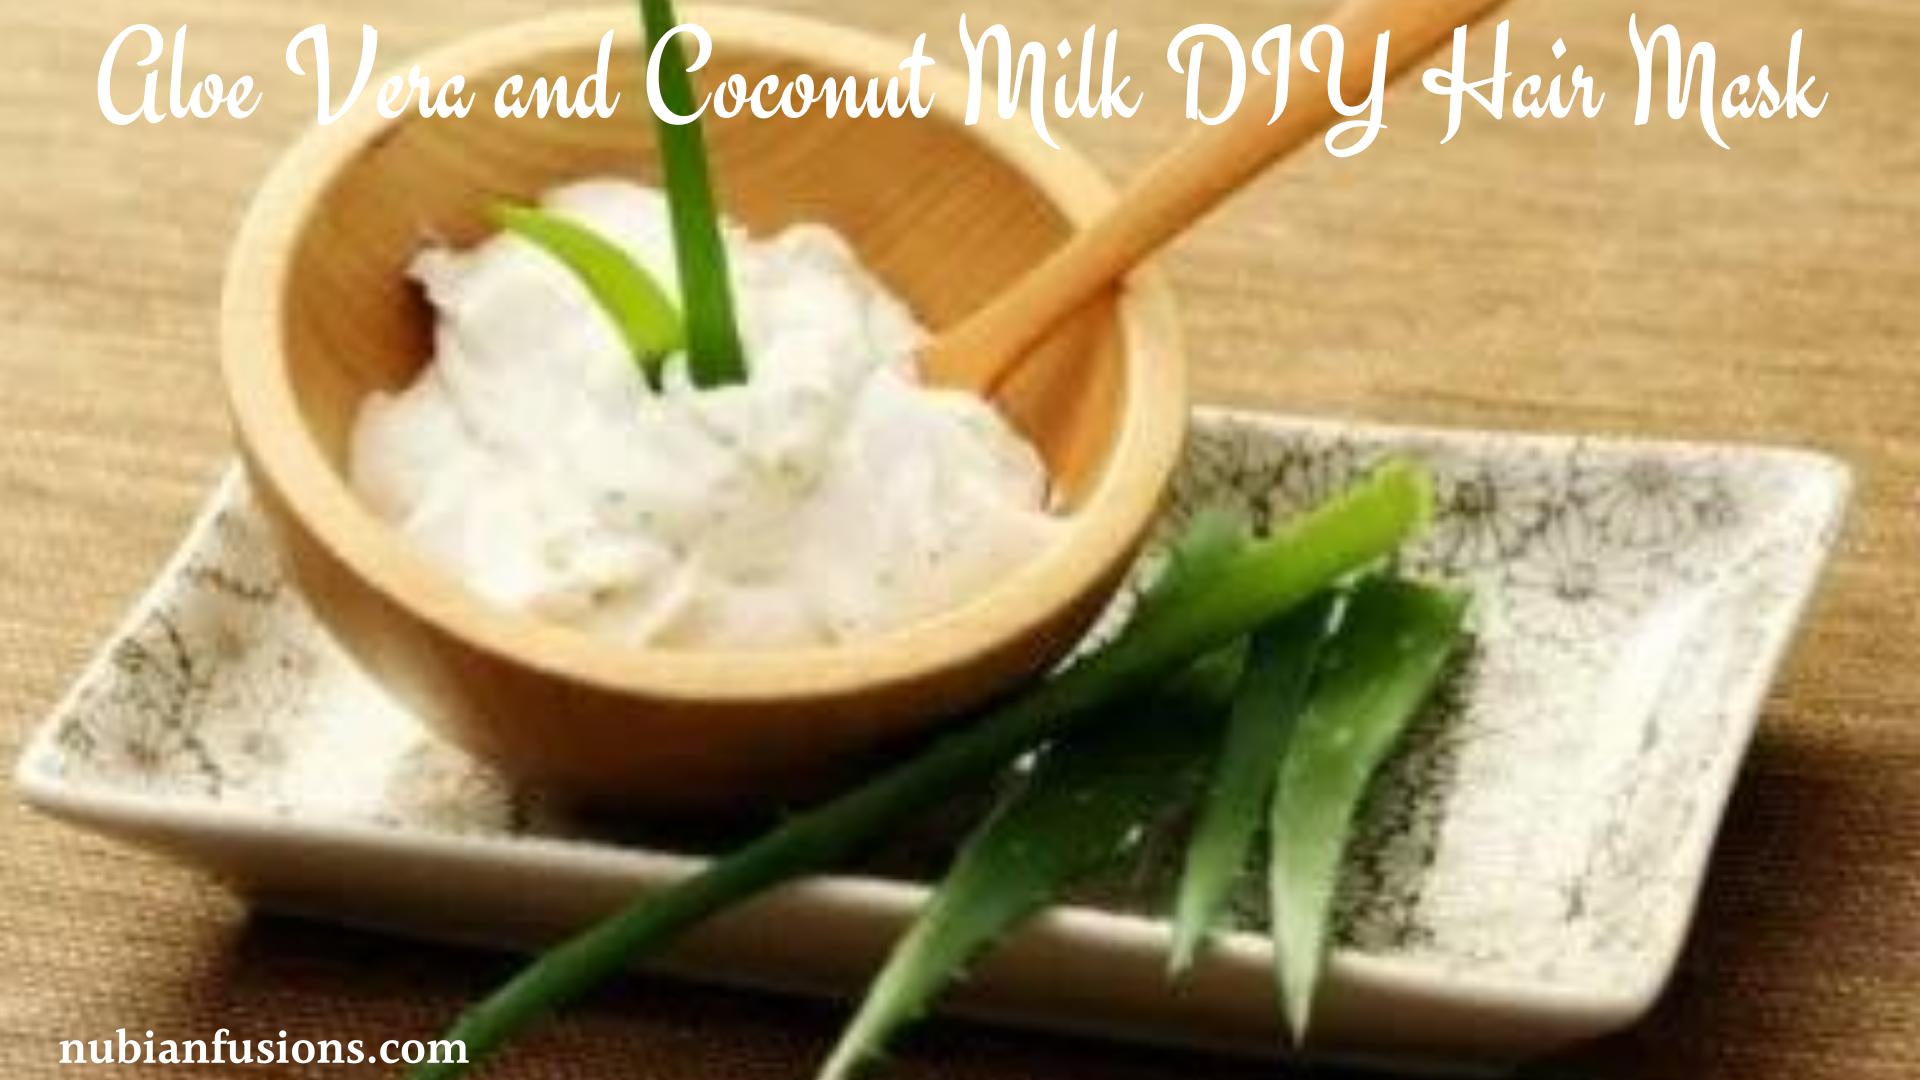 Aloe Vera and Coconut Milk DIY Hair Mask